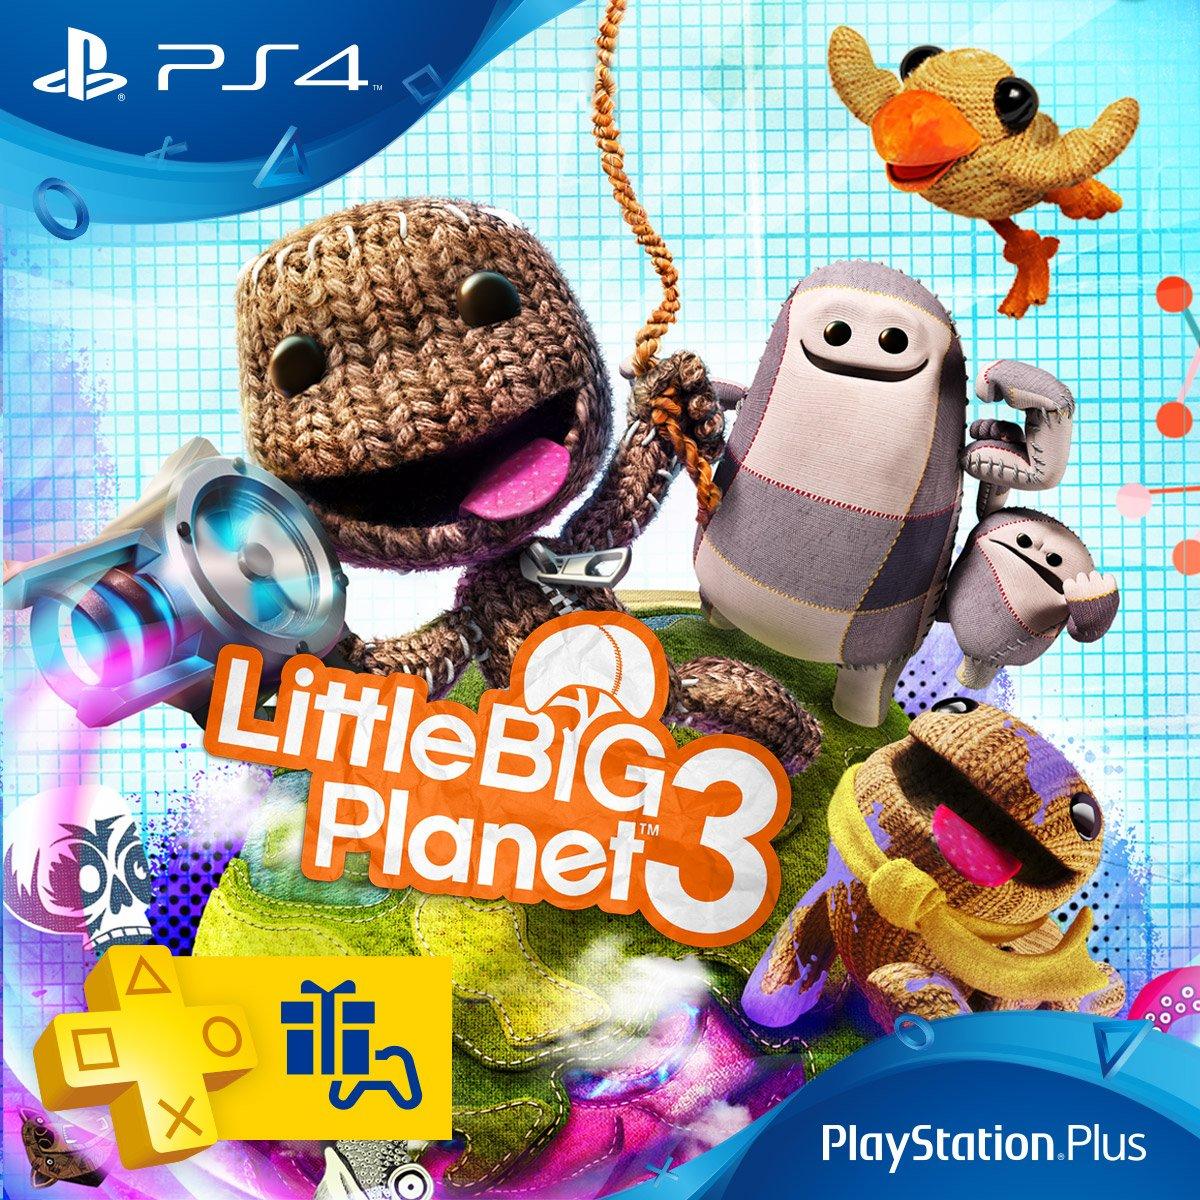 littlebigplanet 3 meet oddsock sonic